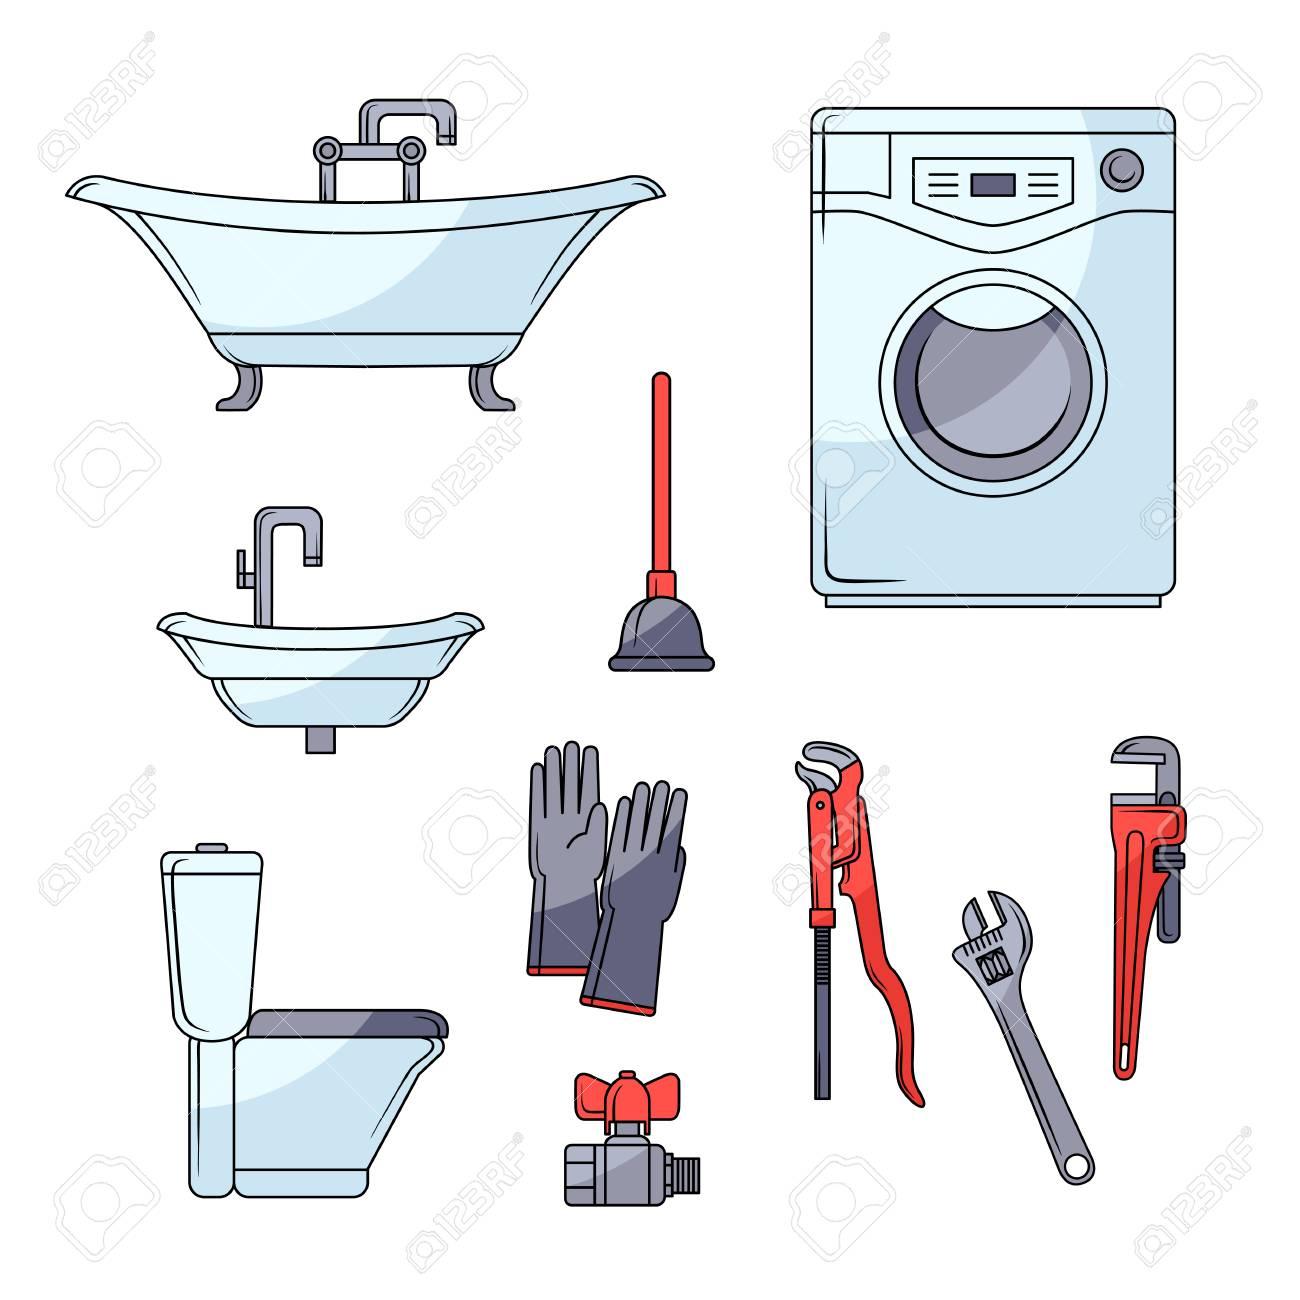 Plumbing Set Bathtub Toilet Bowl Sink Washing Machine Plumber Royalty Free Cliparts Vectors And Stock Illustration Image 92179334